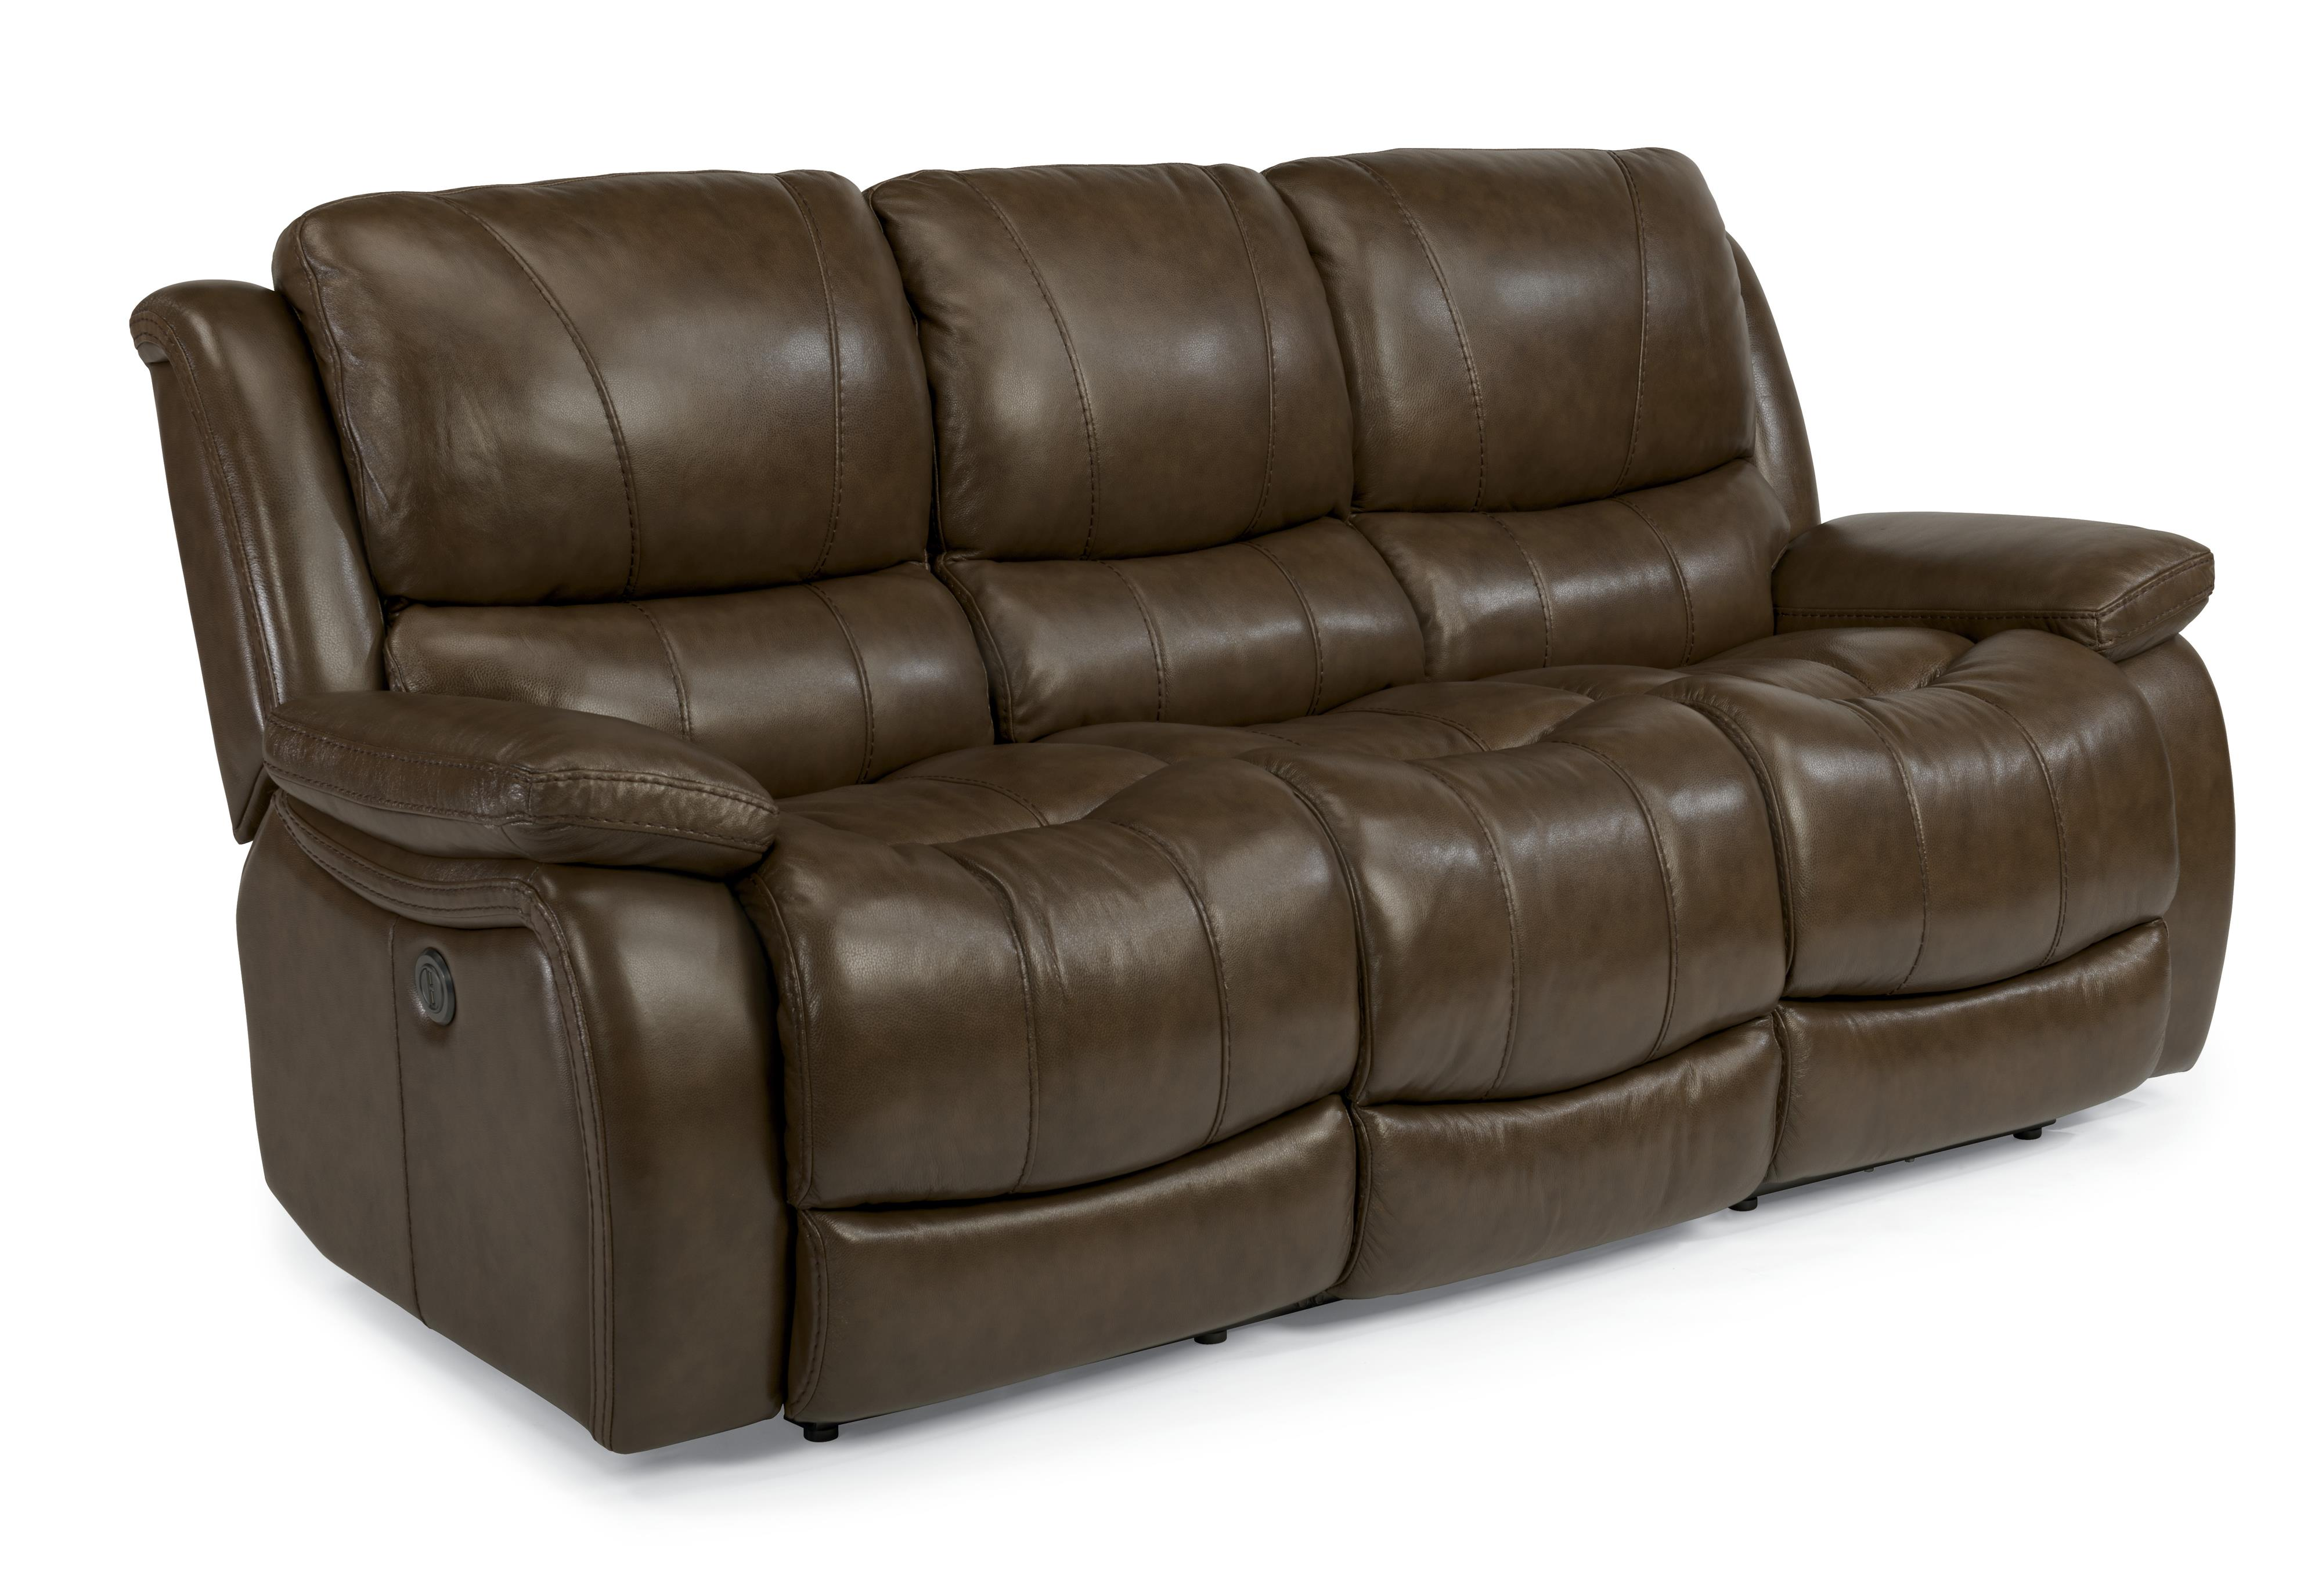 Flexsteel Latitudes-Zandra Lay Flat Power Reclining Sofa - Item Number: 1343-62P-034-74